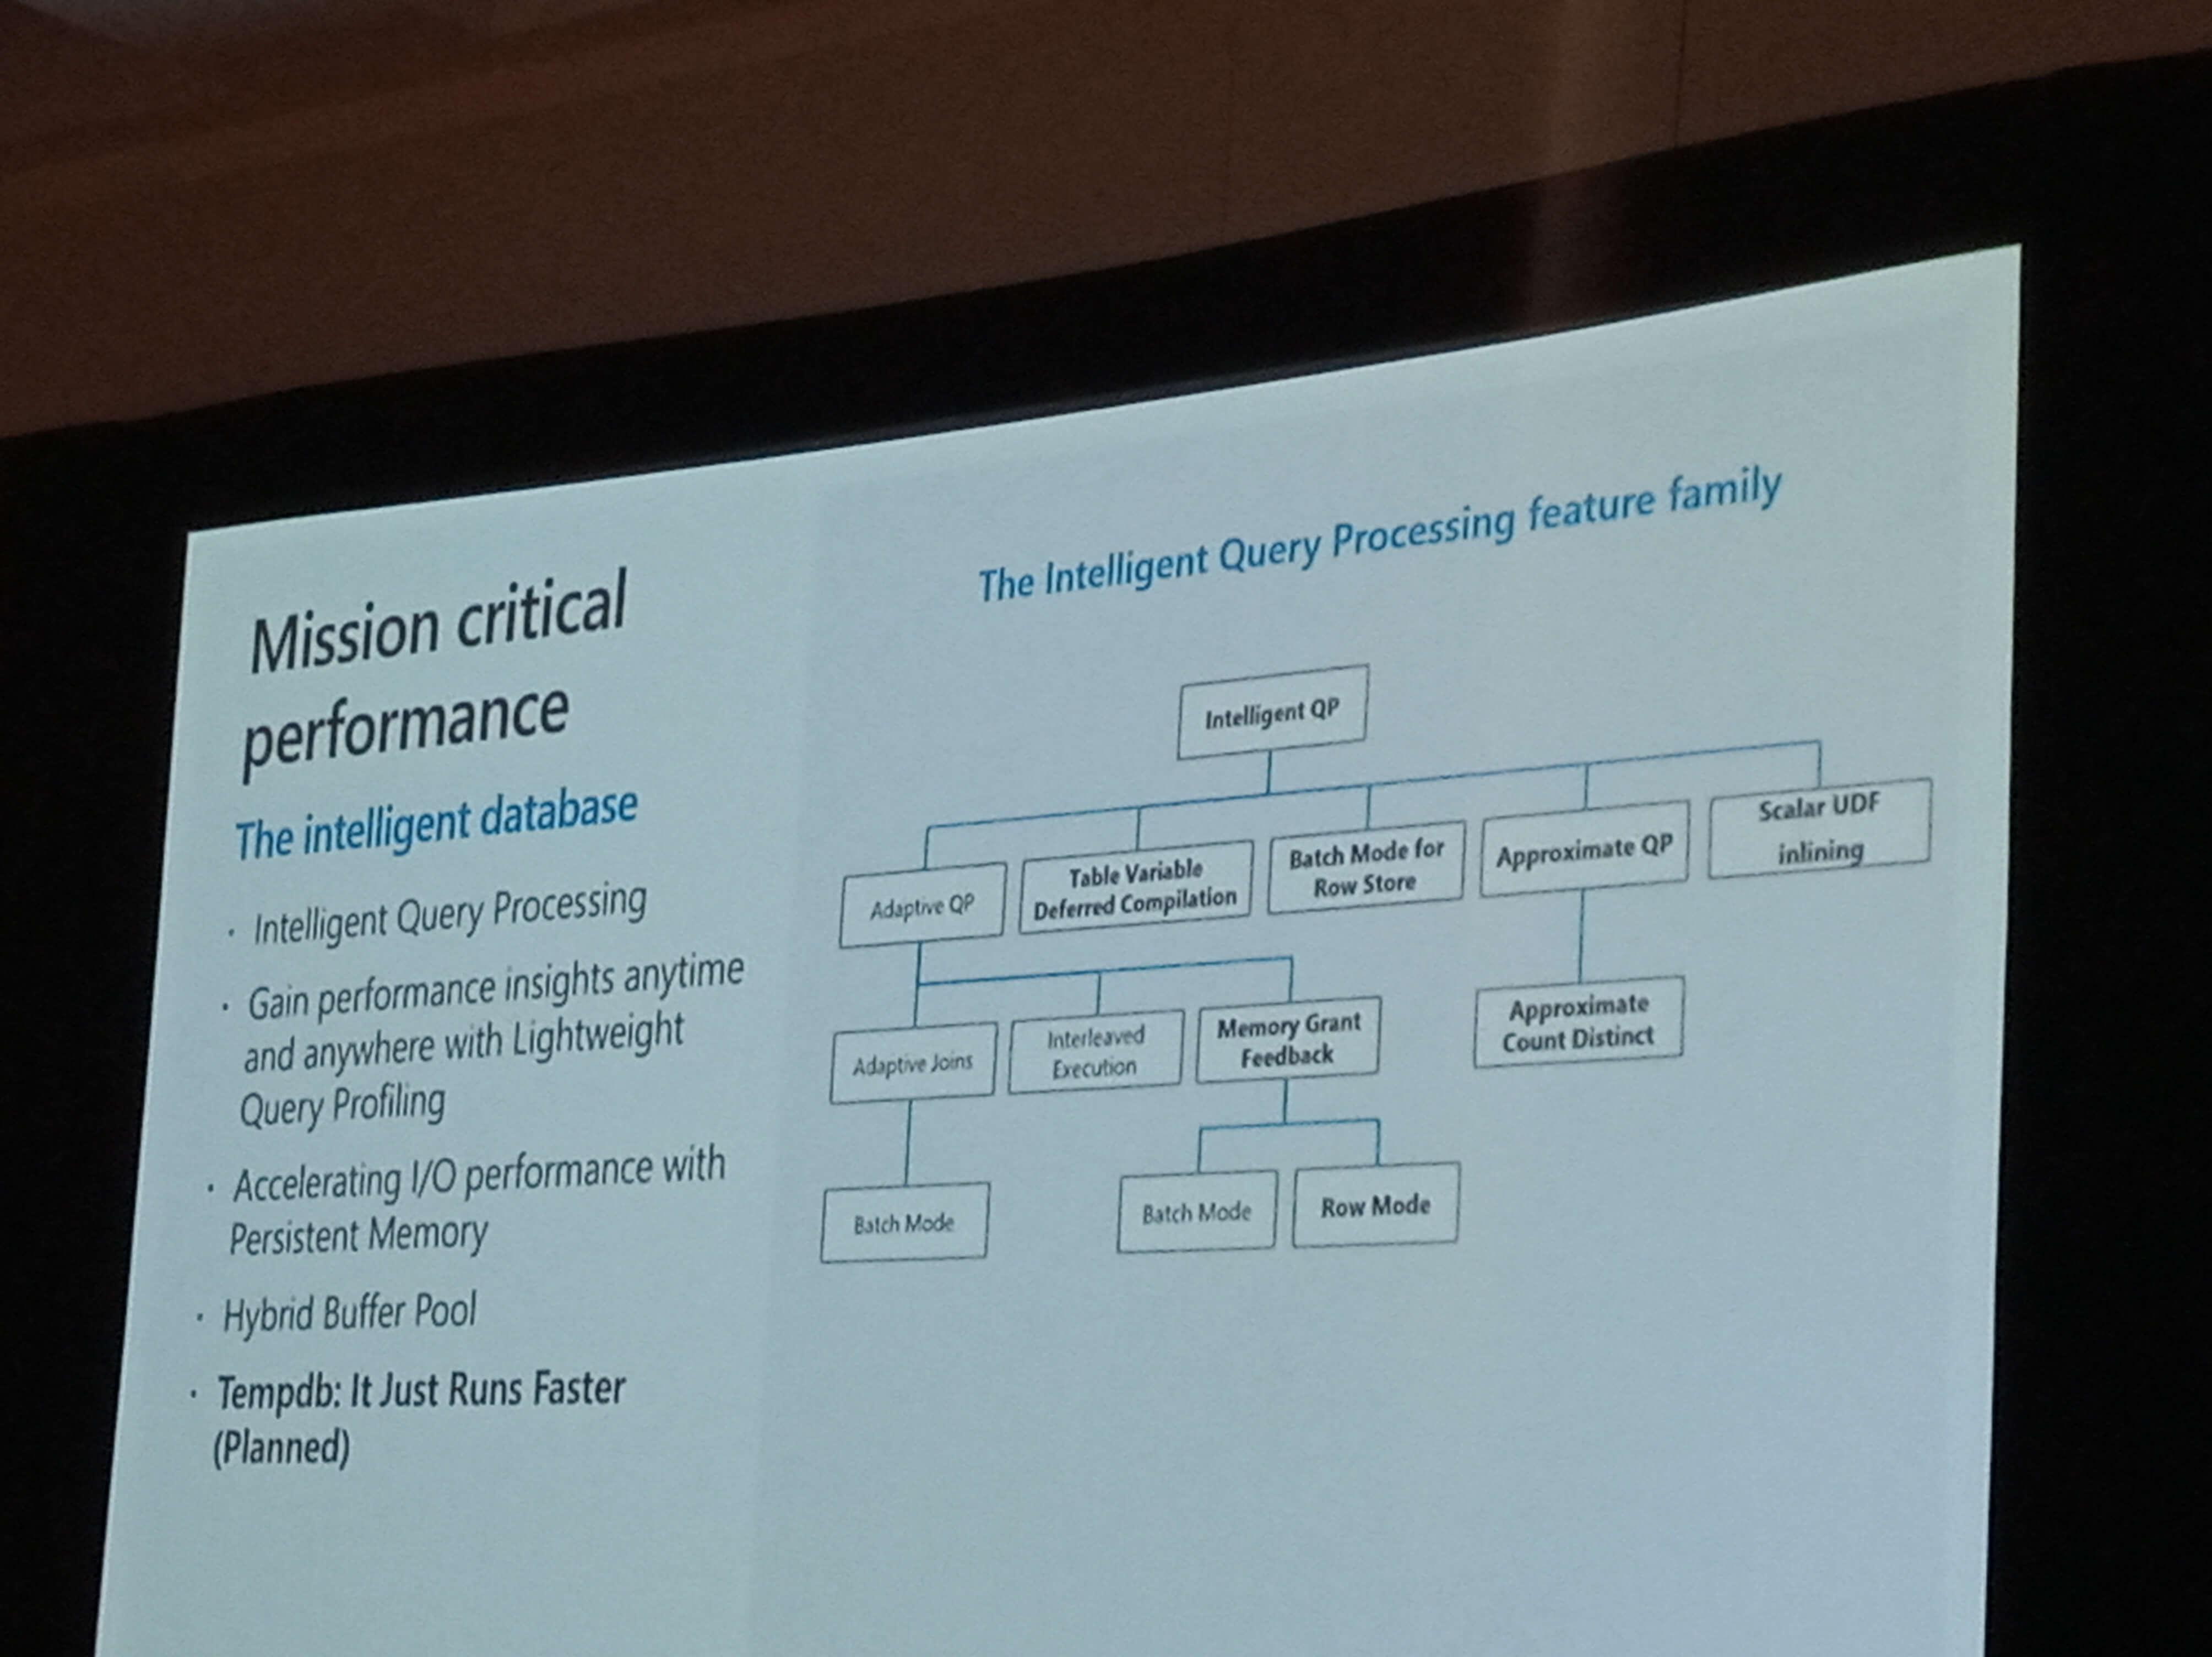 PASS Summit Intelligent Query Processing